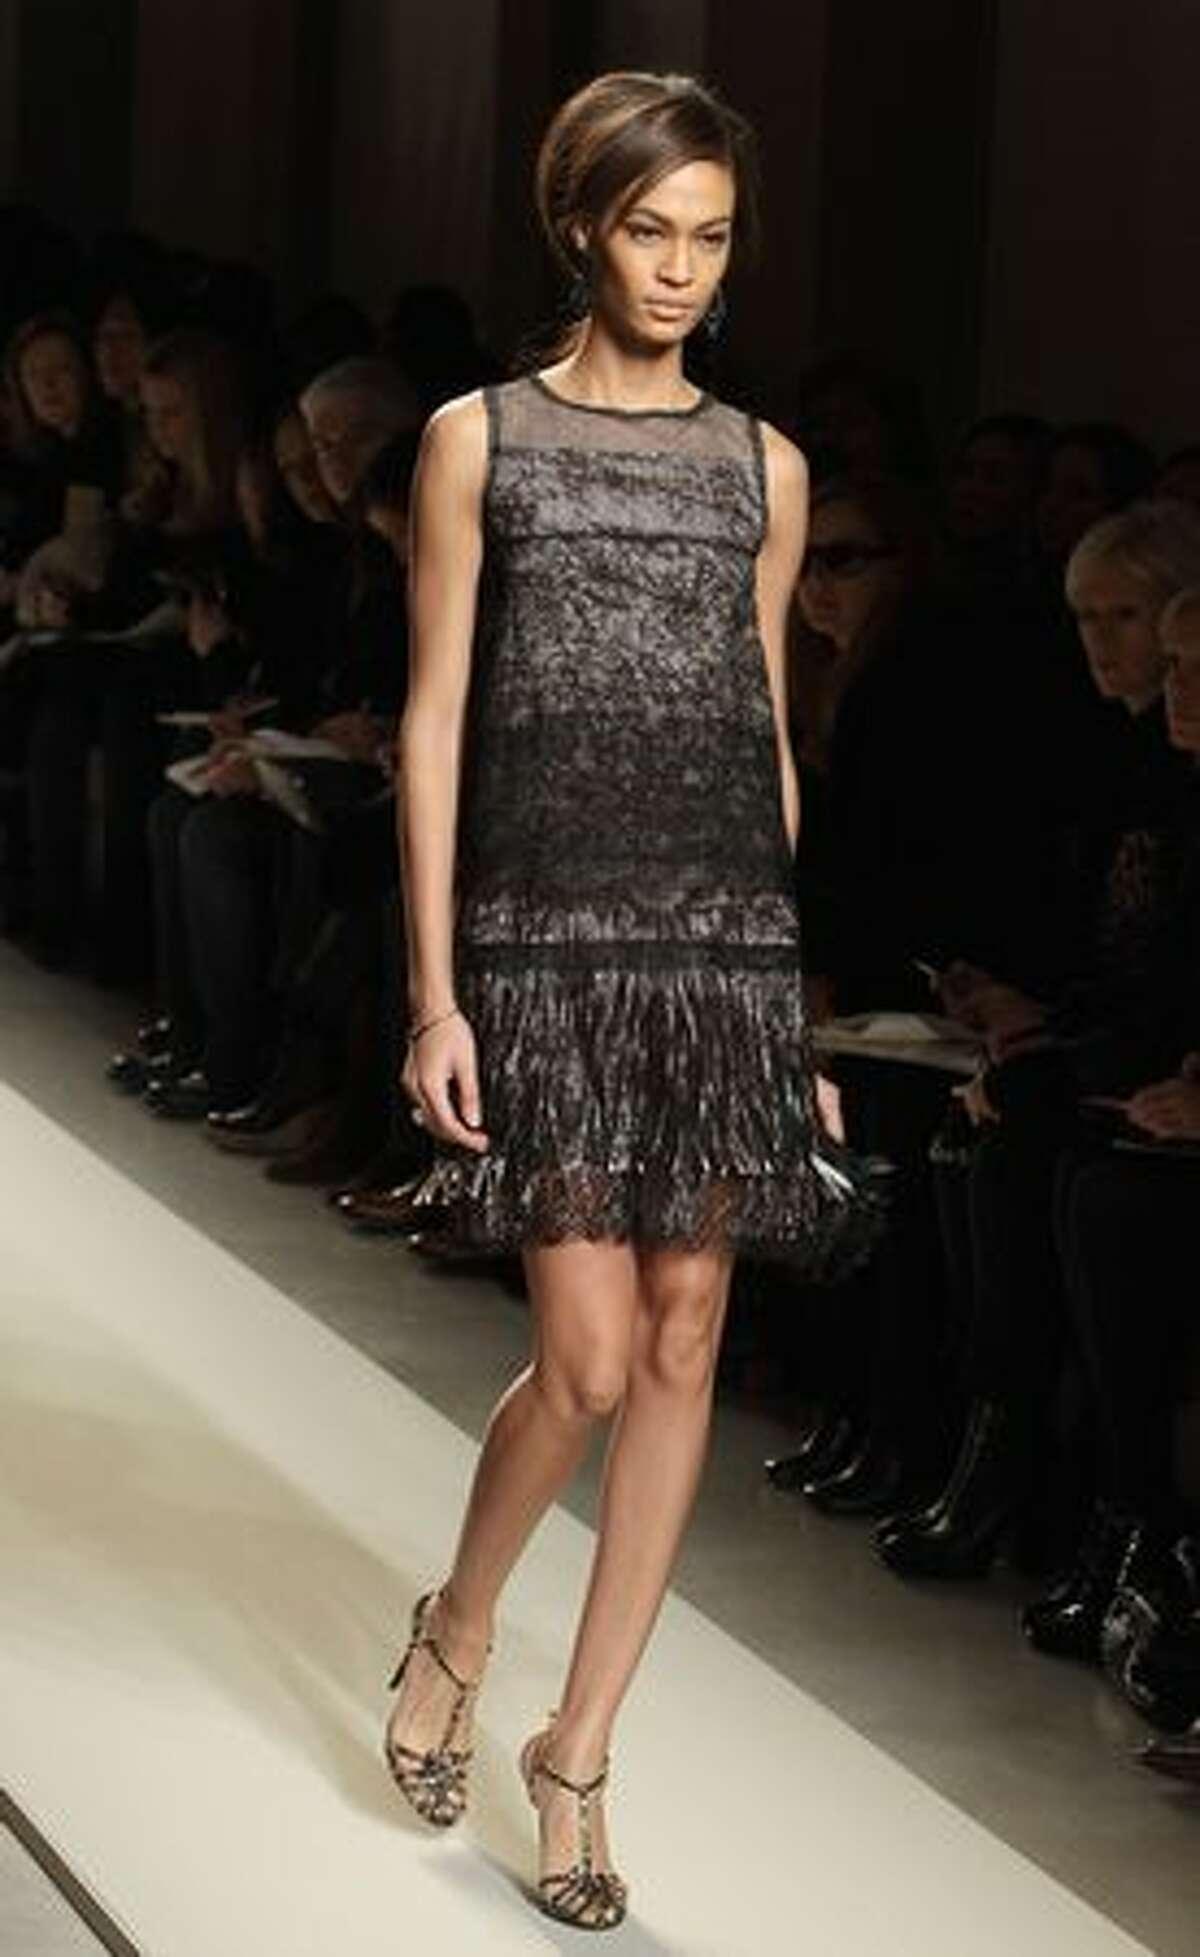 A model walks the runway during the Bottega Veneta show.